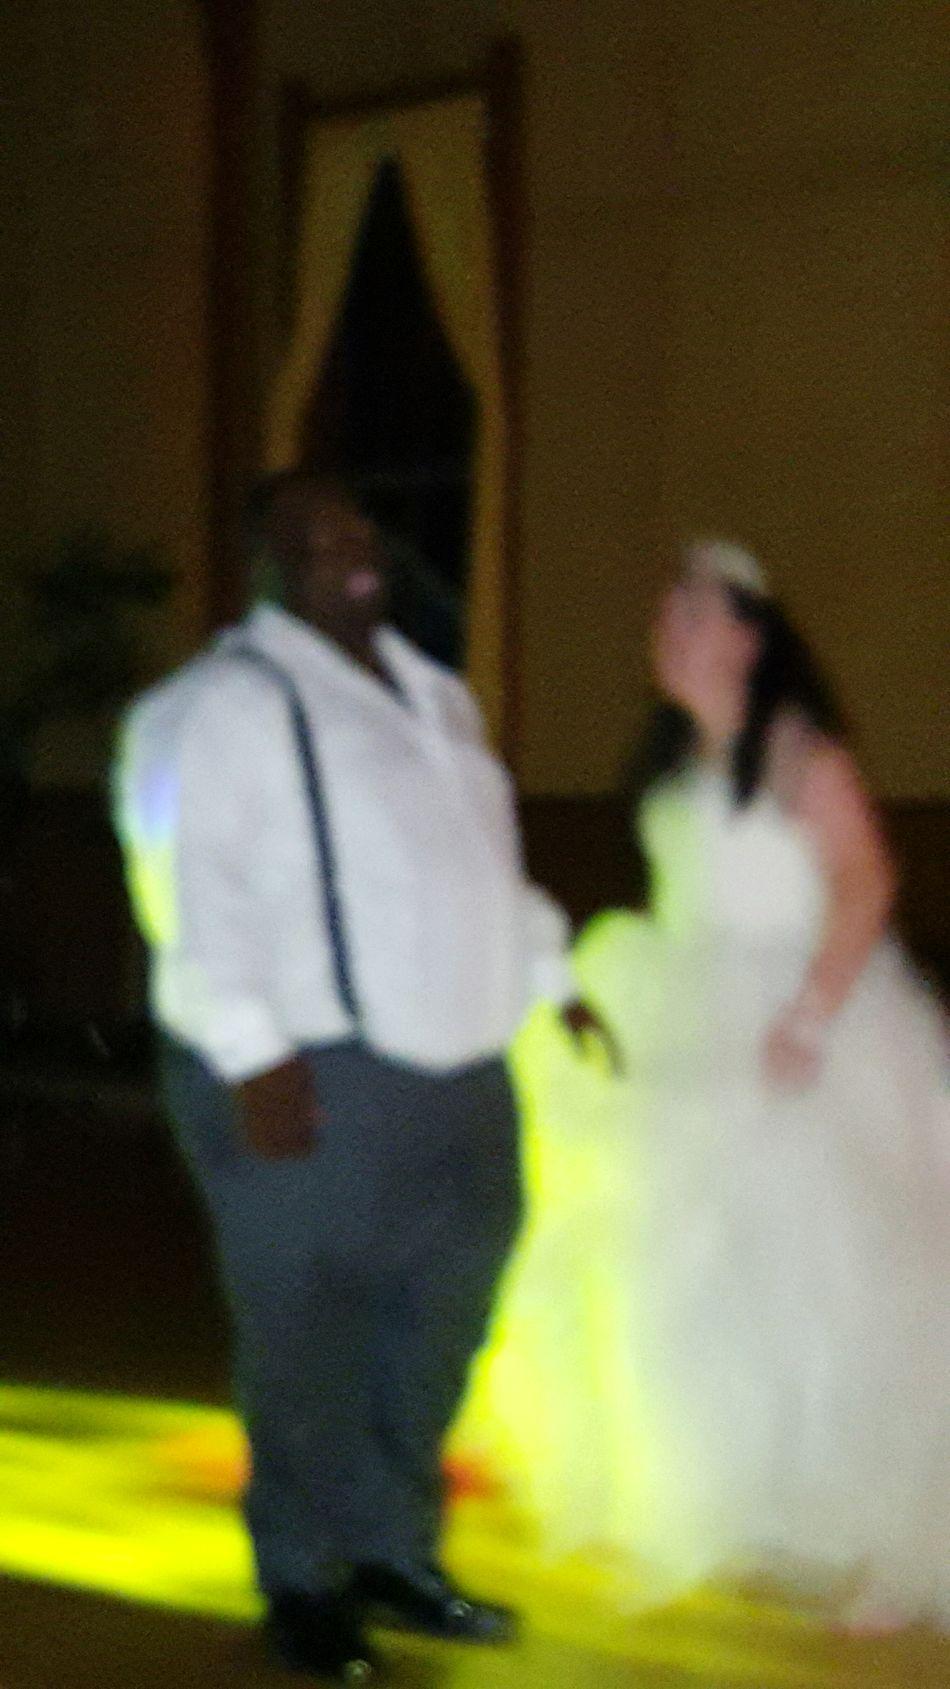 Glitch Wedding Party Wedding Reception Bride And Groom The Groom Brideandgroom